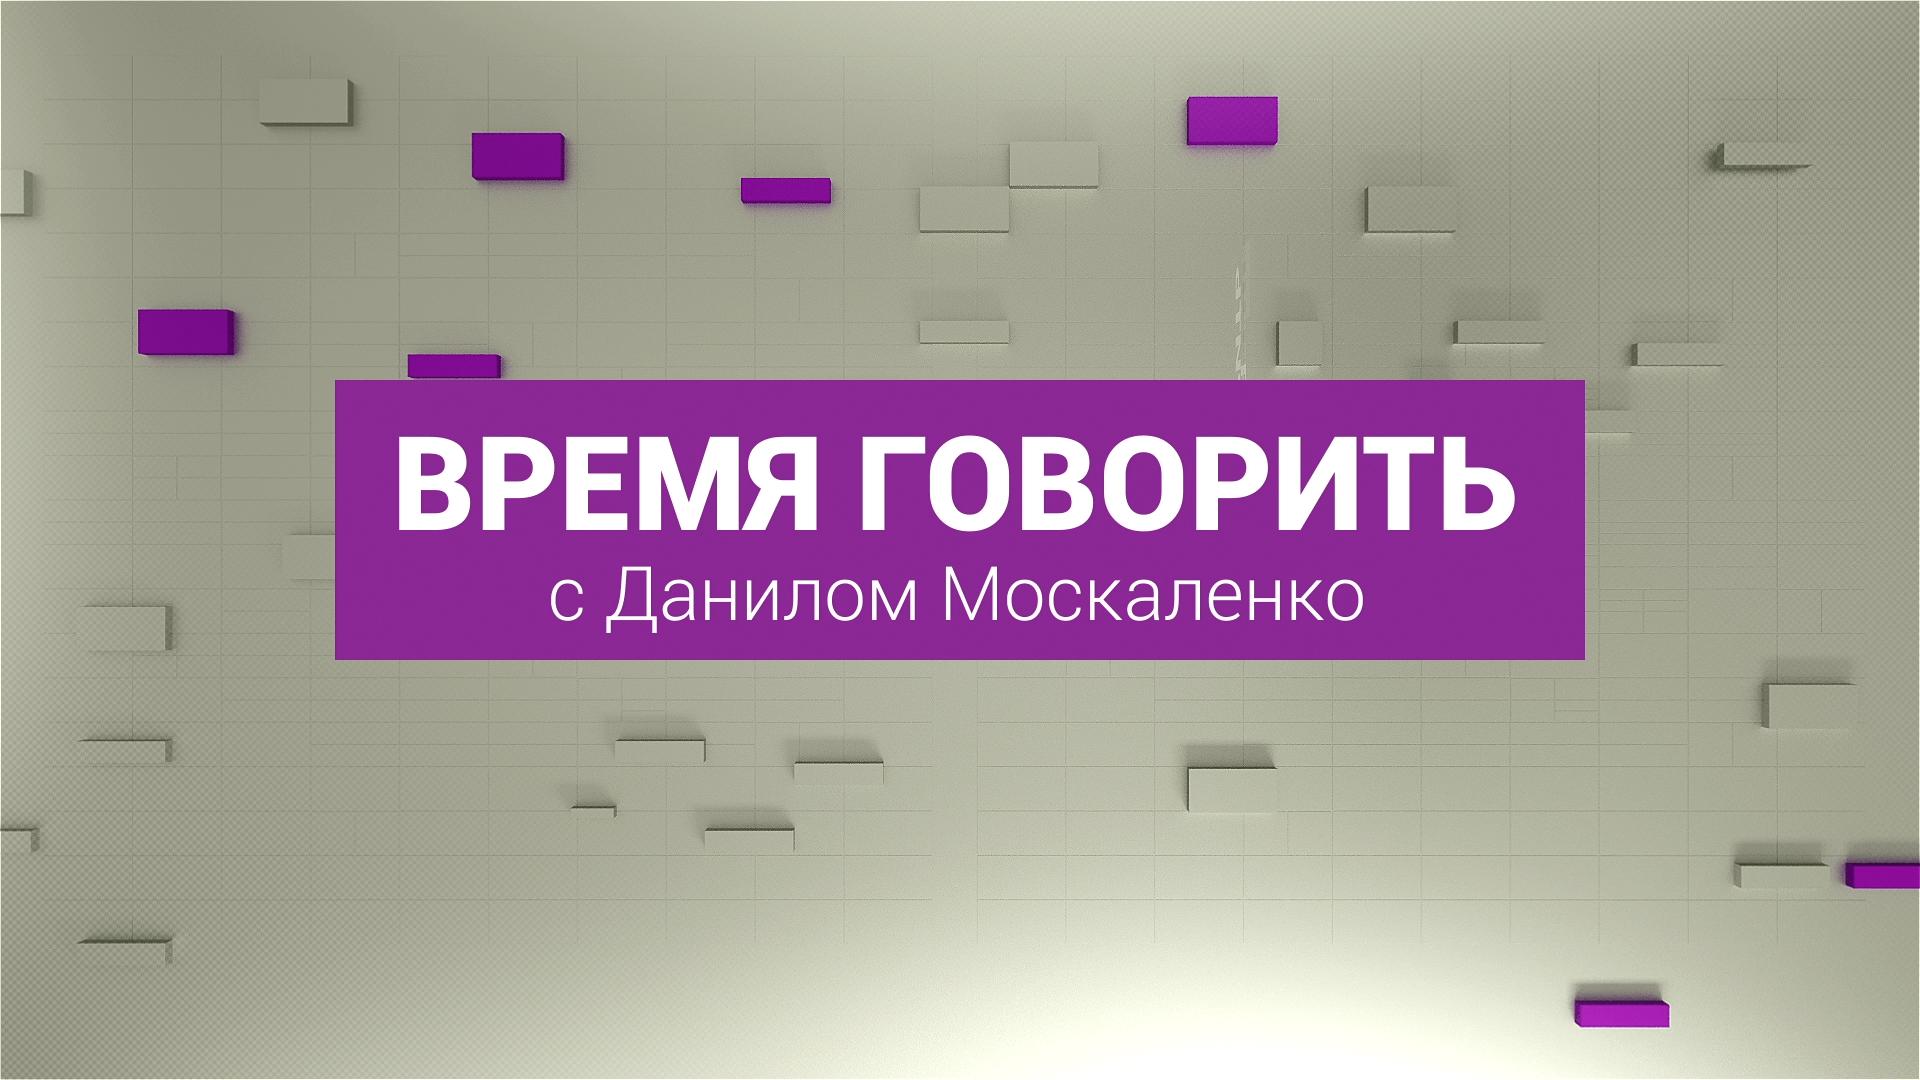 https://inbusiness.kz/ru/images/medium/9/images/pZOFoTsg.png